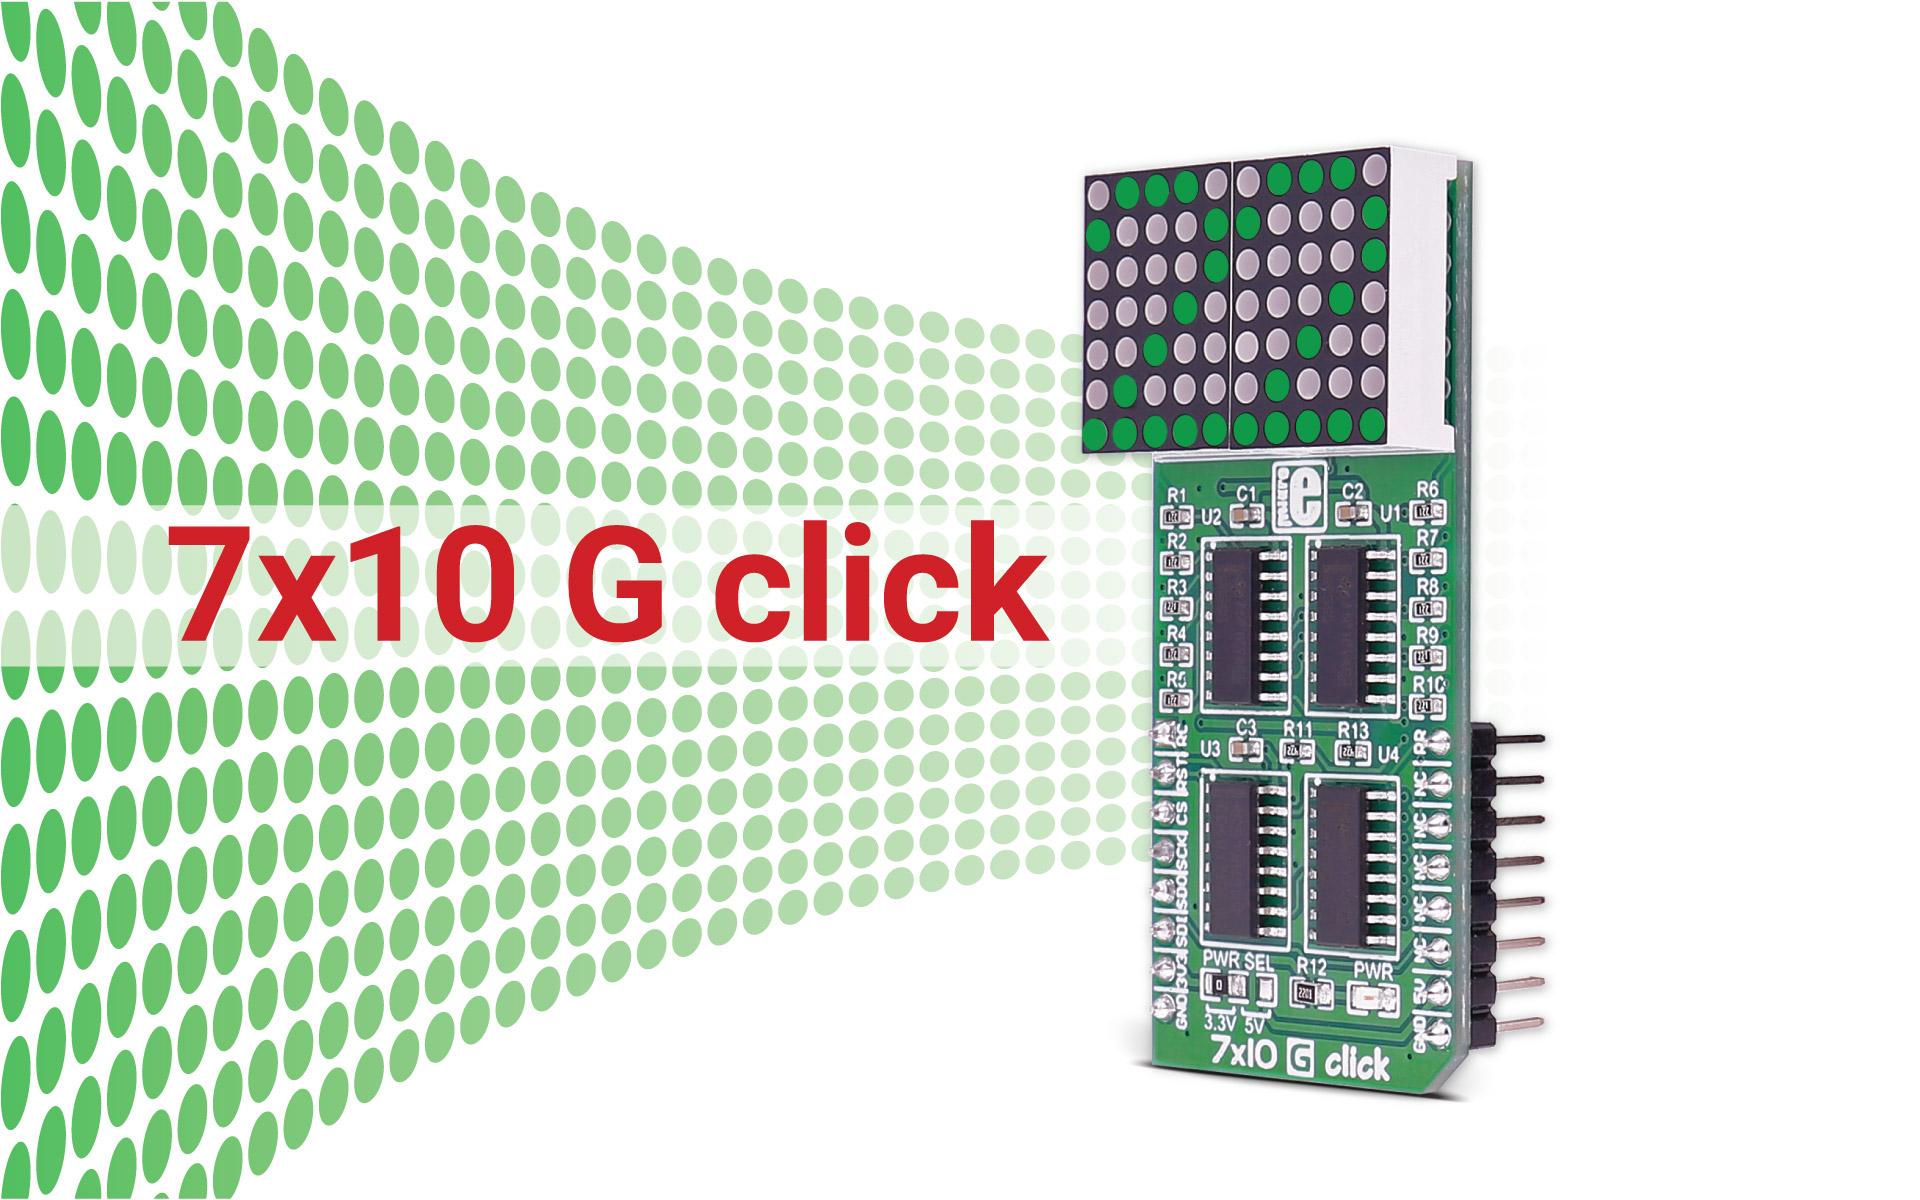 7x10 G click - dual character display